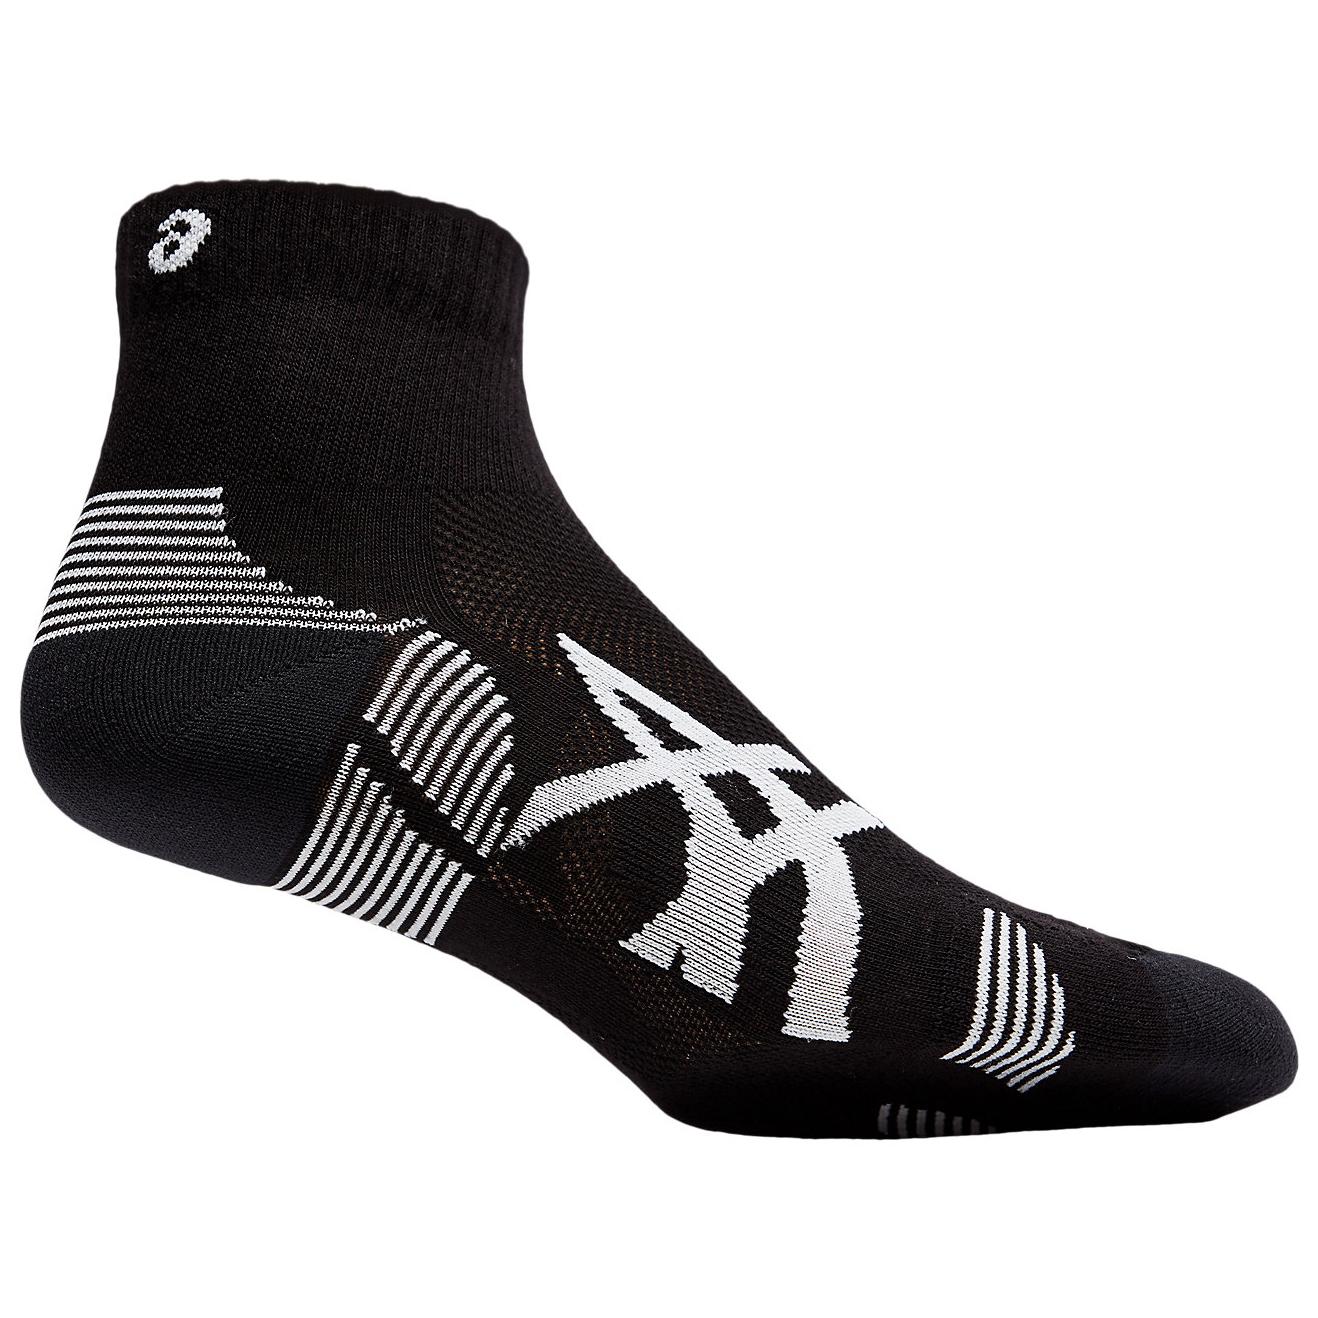 Asics - 2PPK Cushioning Sock - Running socks - Performance Black / Brilliant White   I (US)